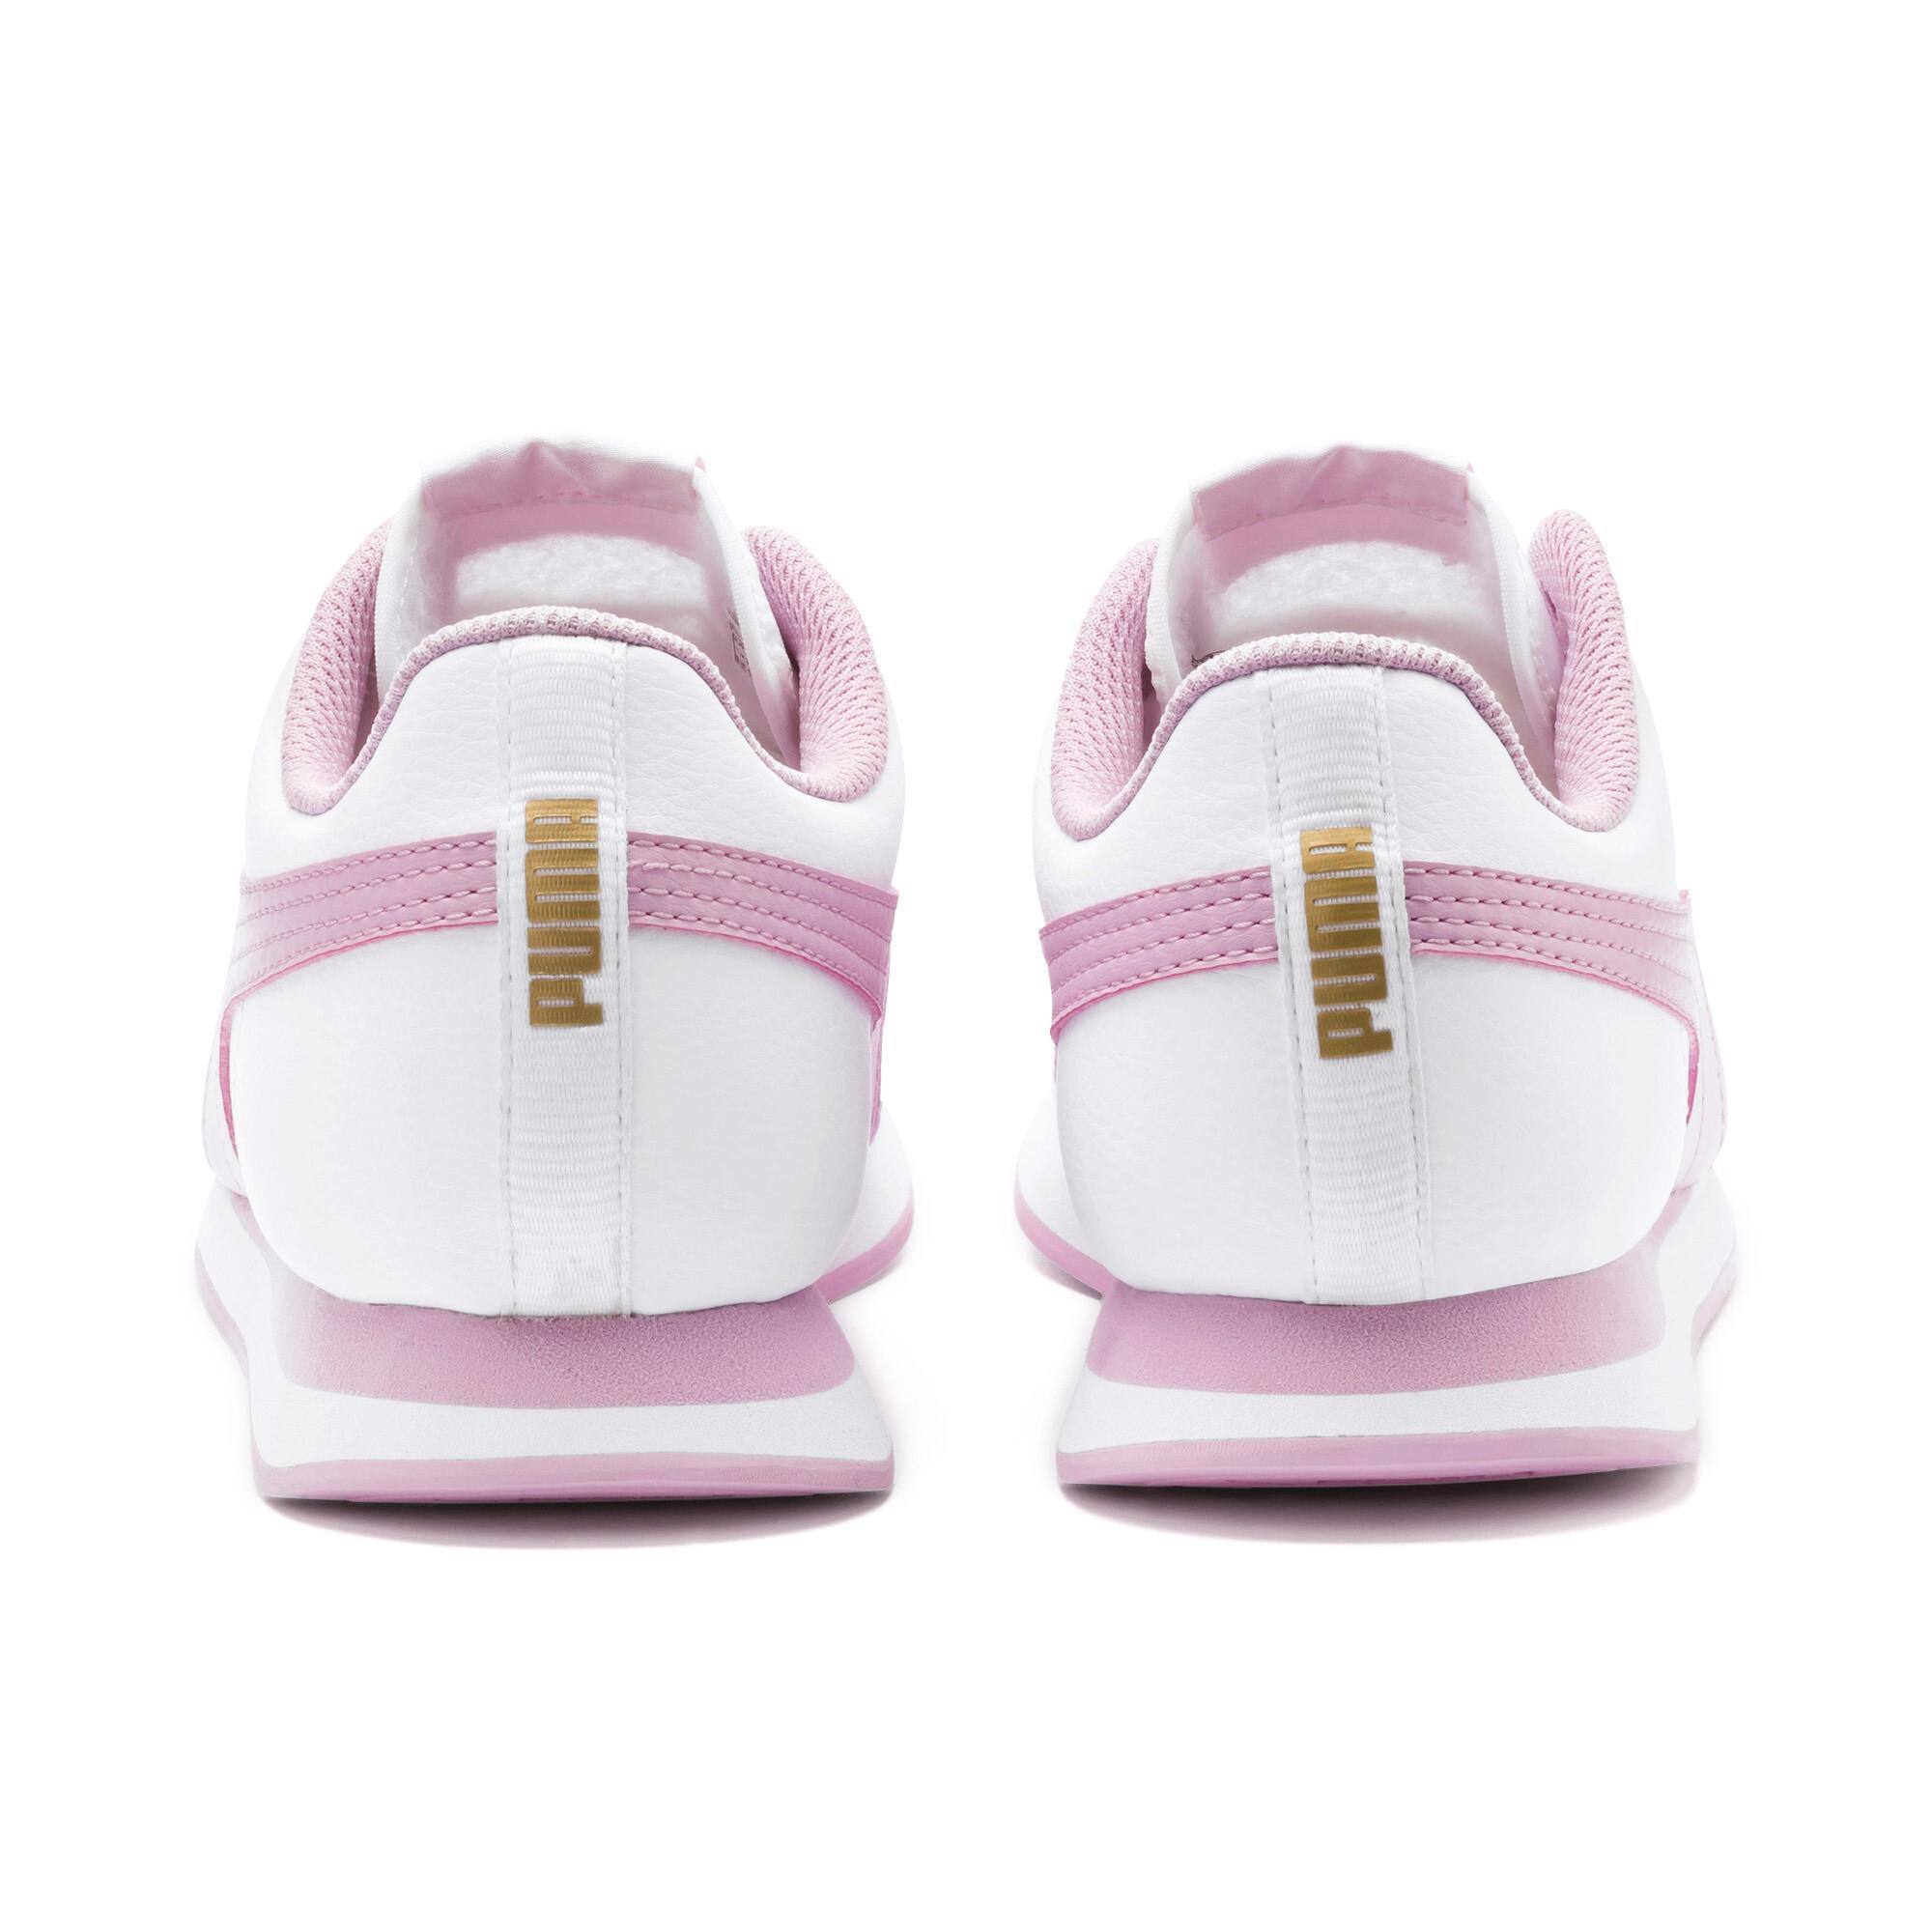 PUMA-Men-039-s-Turin-II-Sneakers thumbnail 25